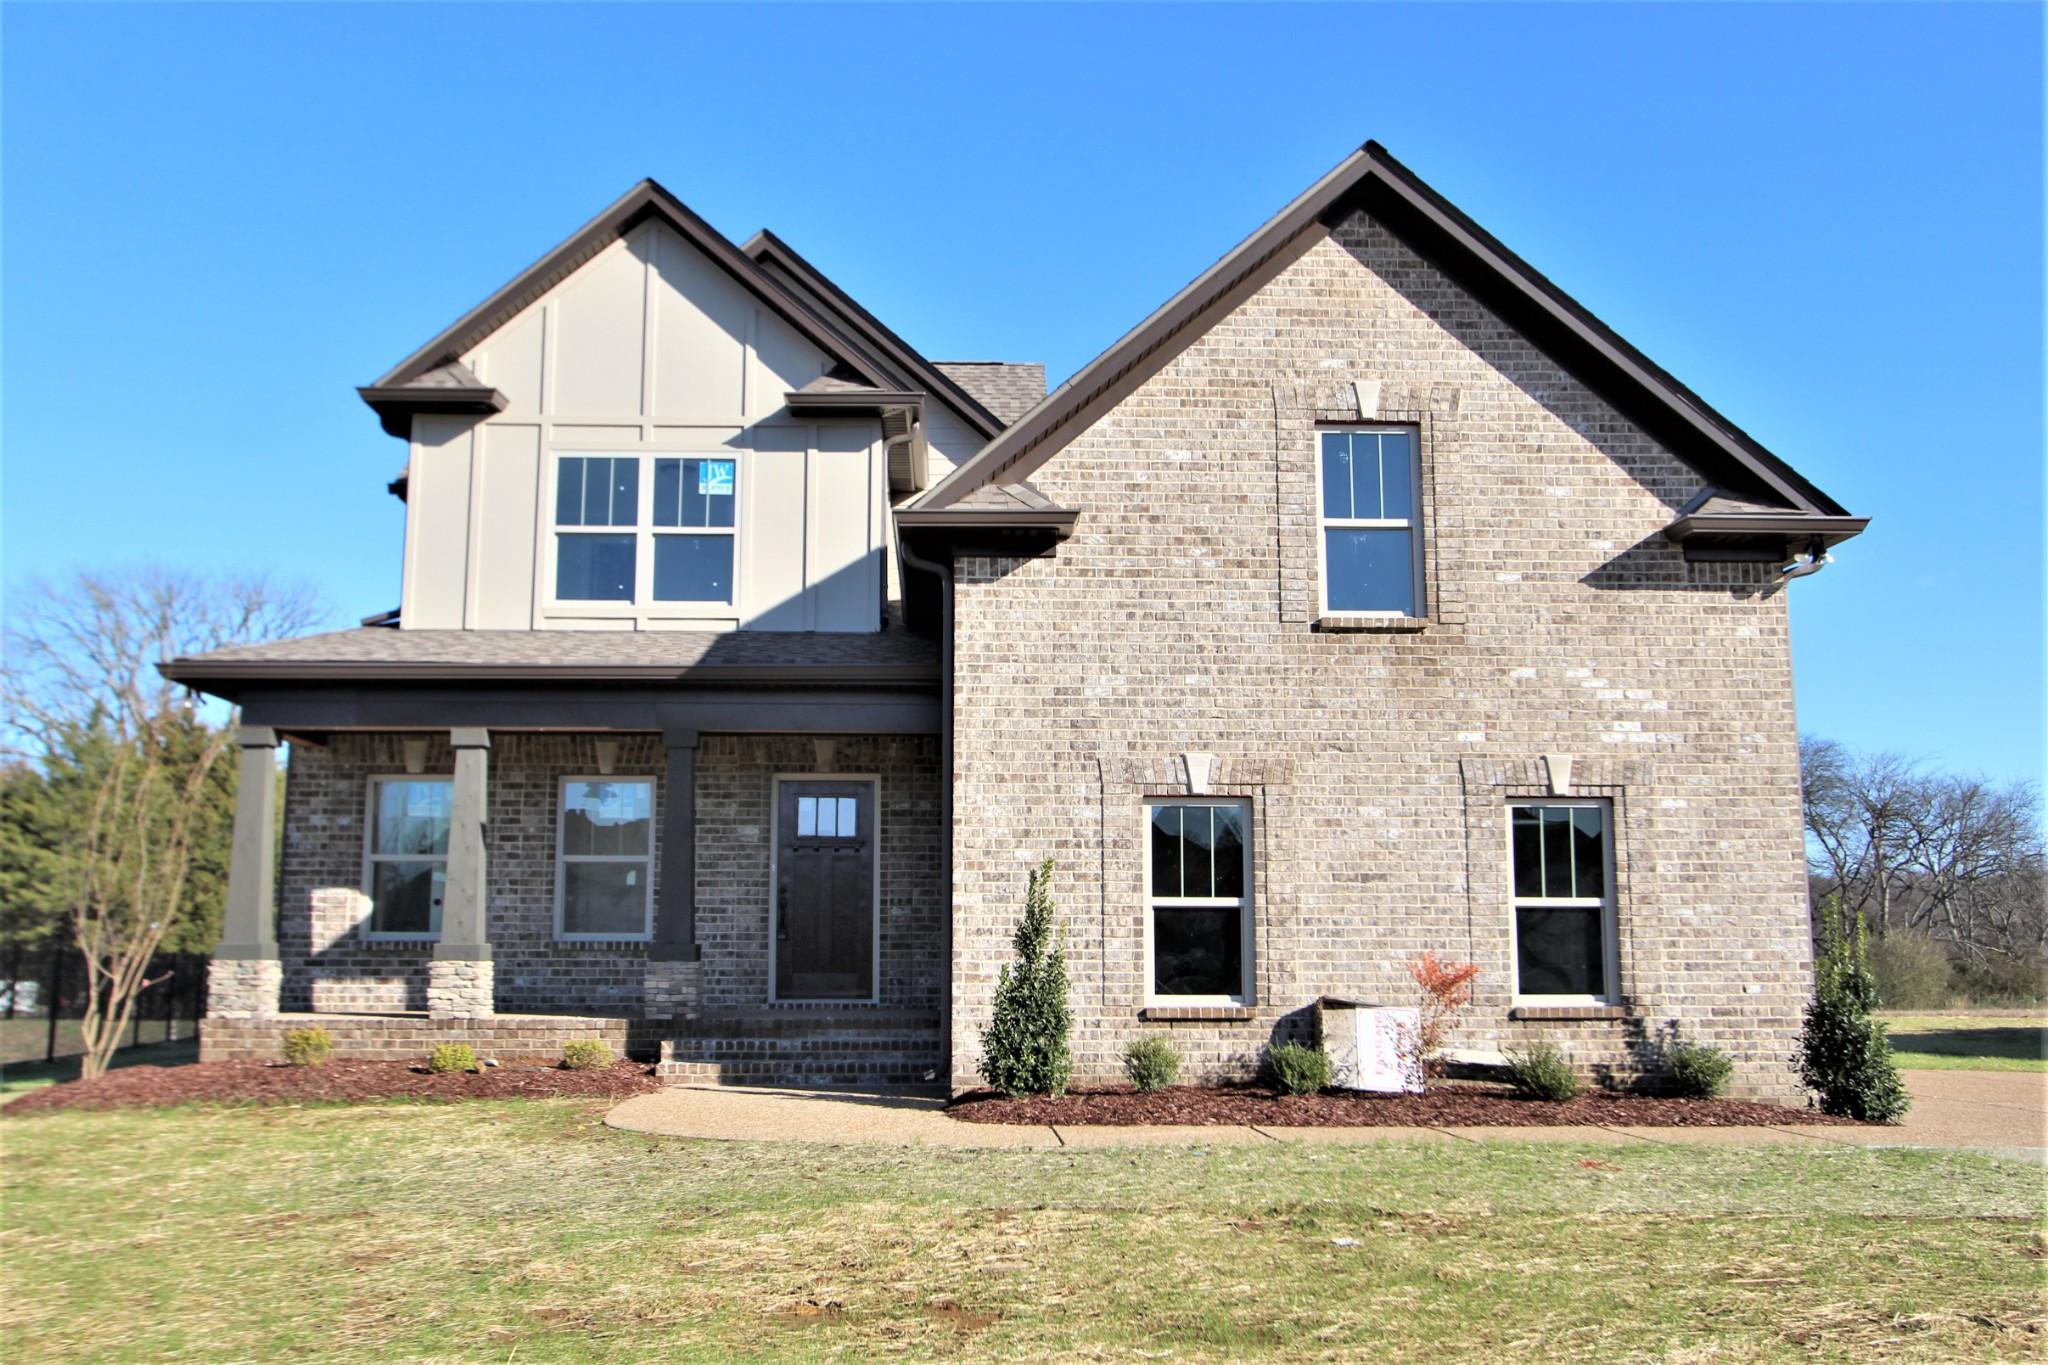 827 Brook Trail #84, Lebanon, TN 37087 - Lebanon, TN real estate listing